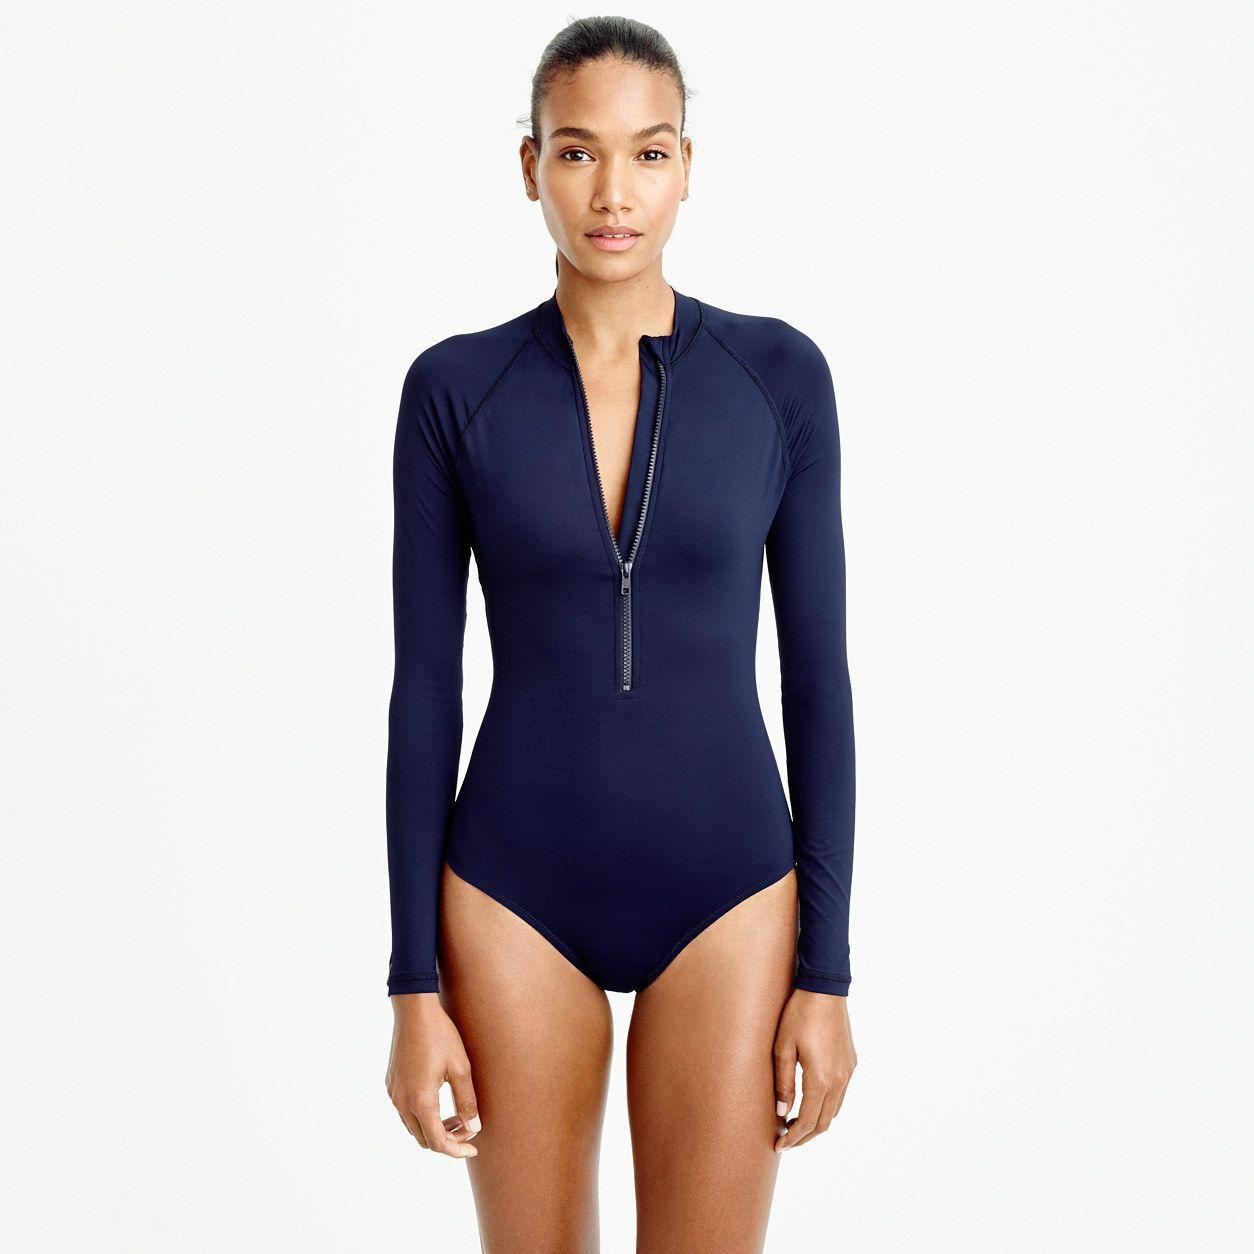 72f18d450b J.Crew Womens Long Torso Zip-Up Long-Sleeve Swimsuit (Size 16 ...